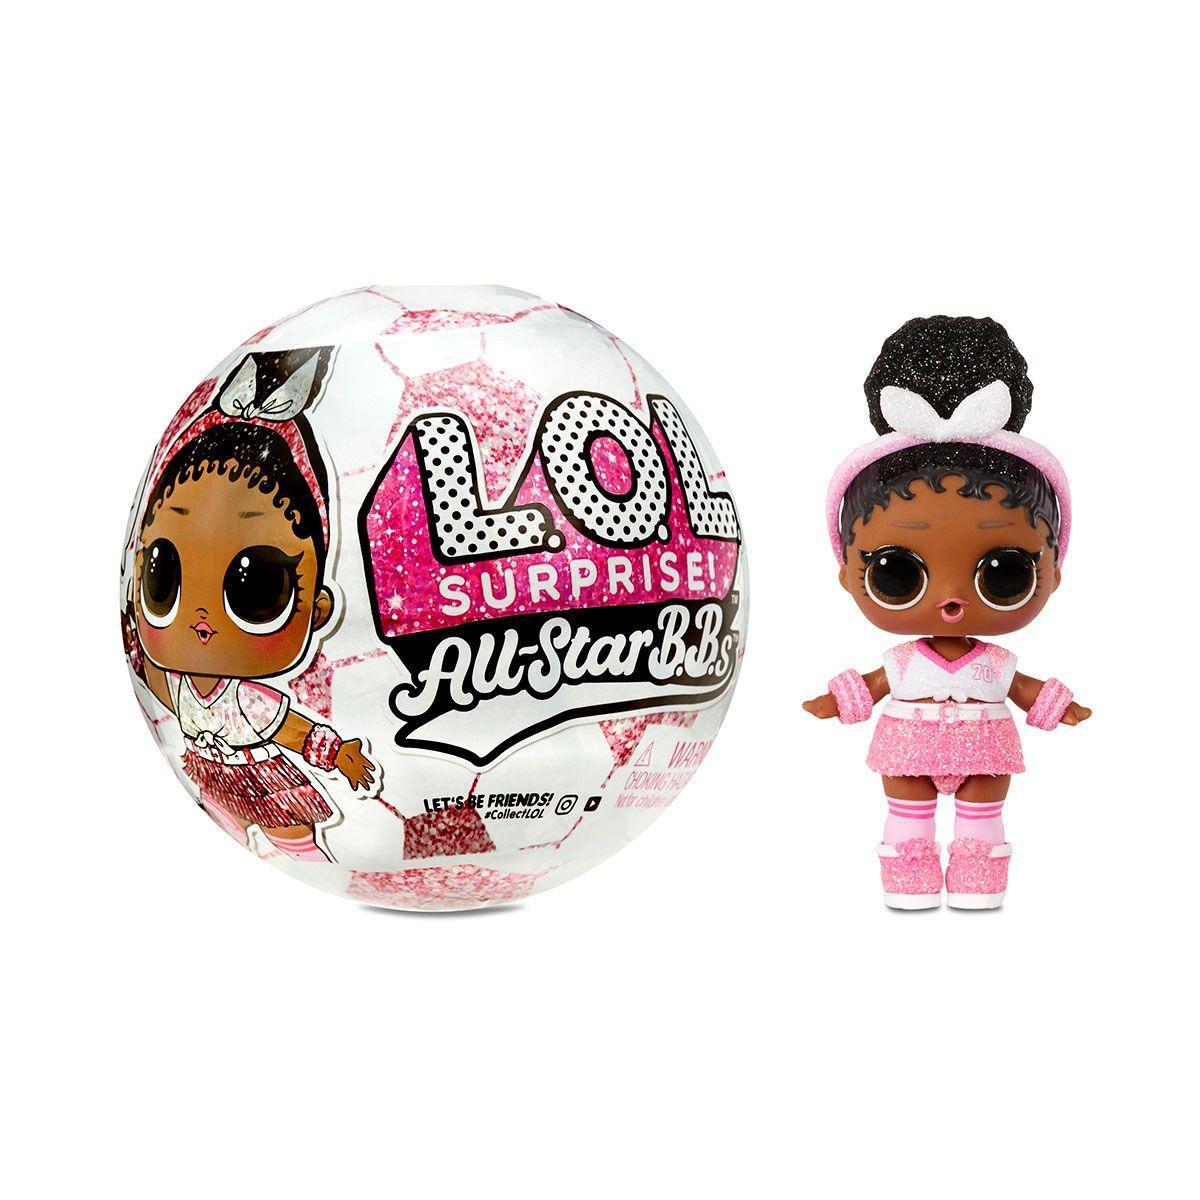 LOL Surprise All-Star B.B.s Sports Series 3 Soccer Team Sparkly Dolls Ляльки лол Футболістки